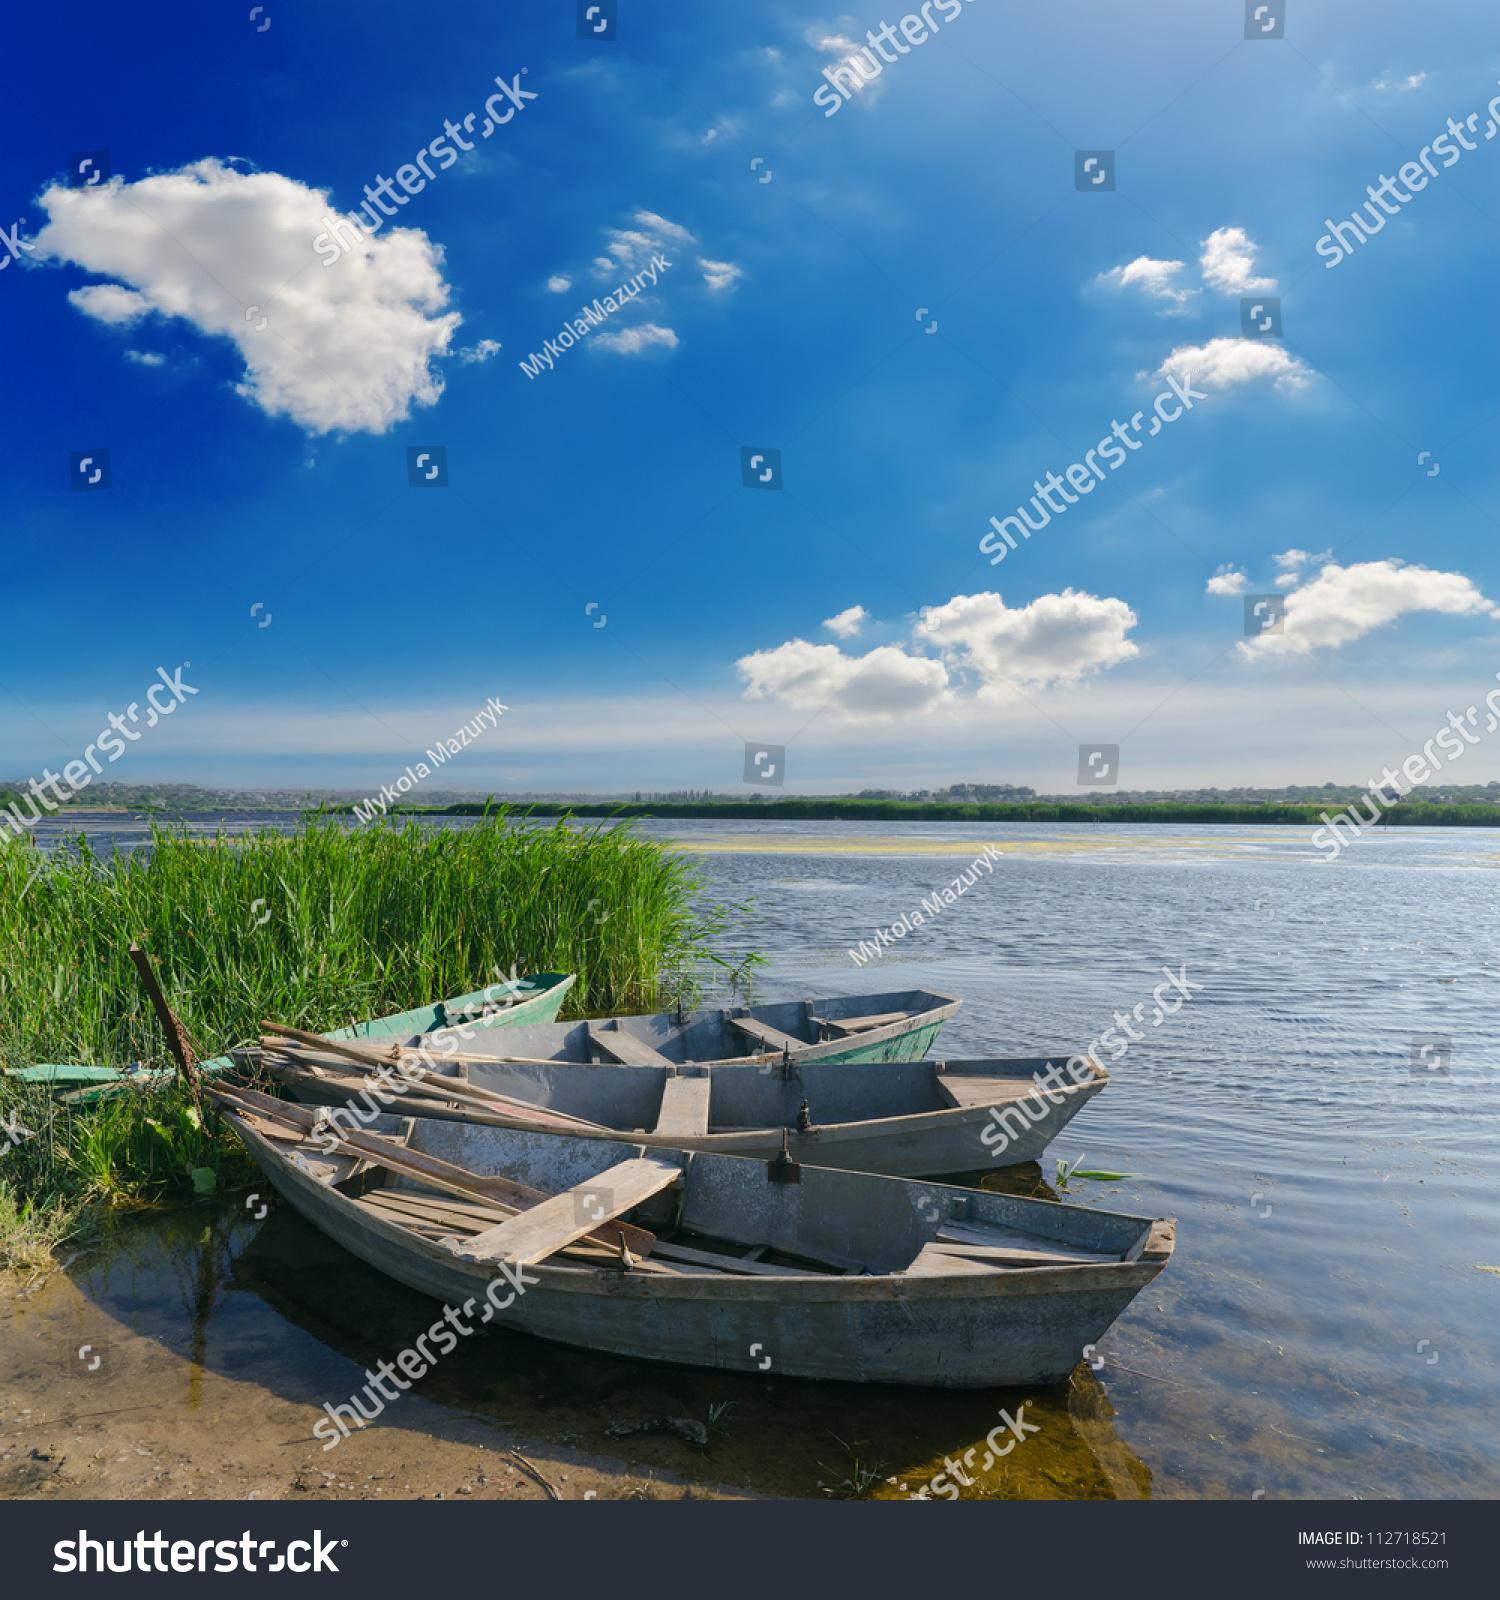 2560x1600 river grass cloudy - photo #29